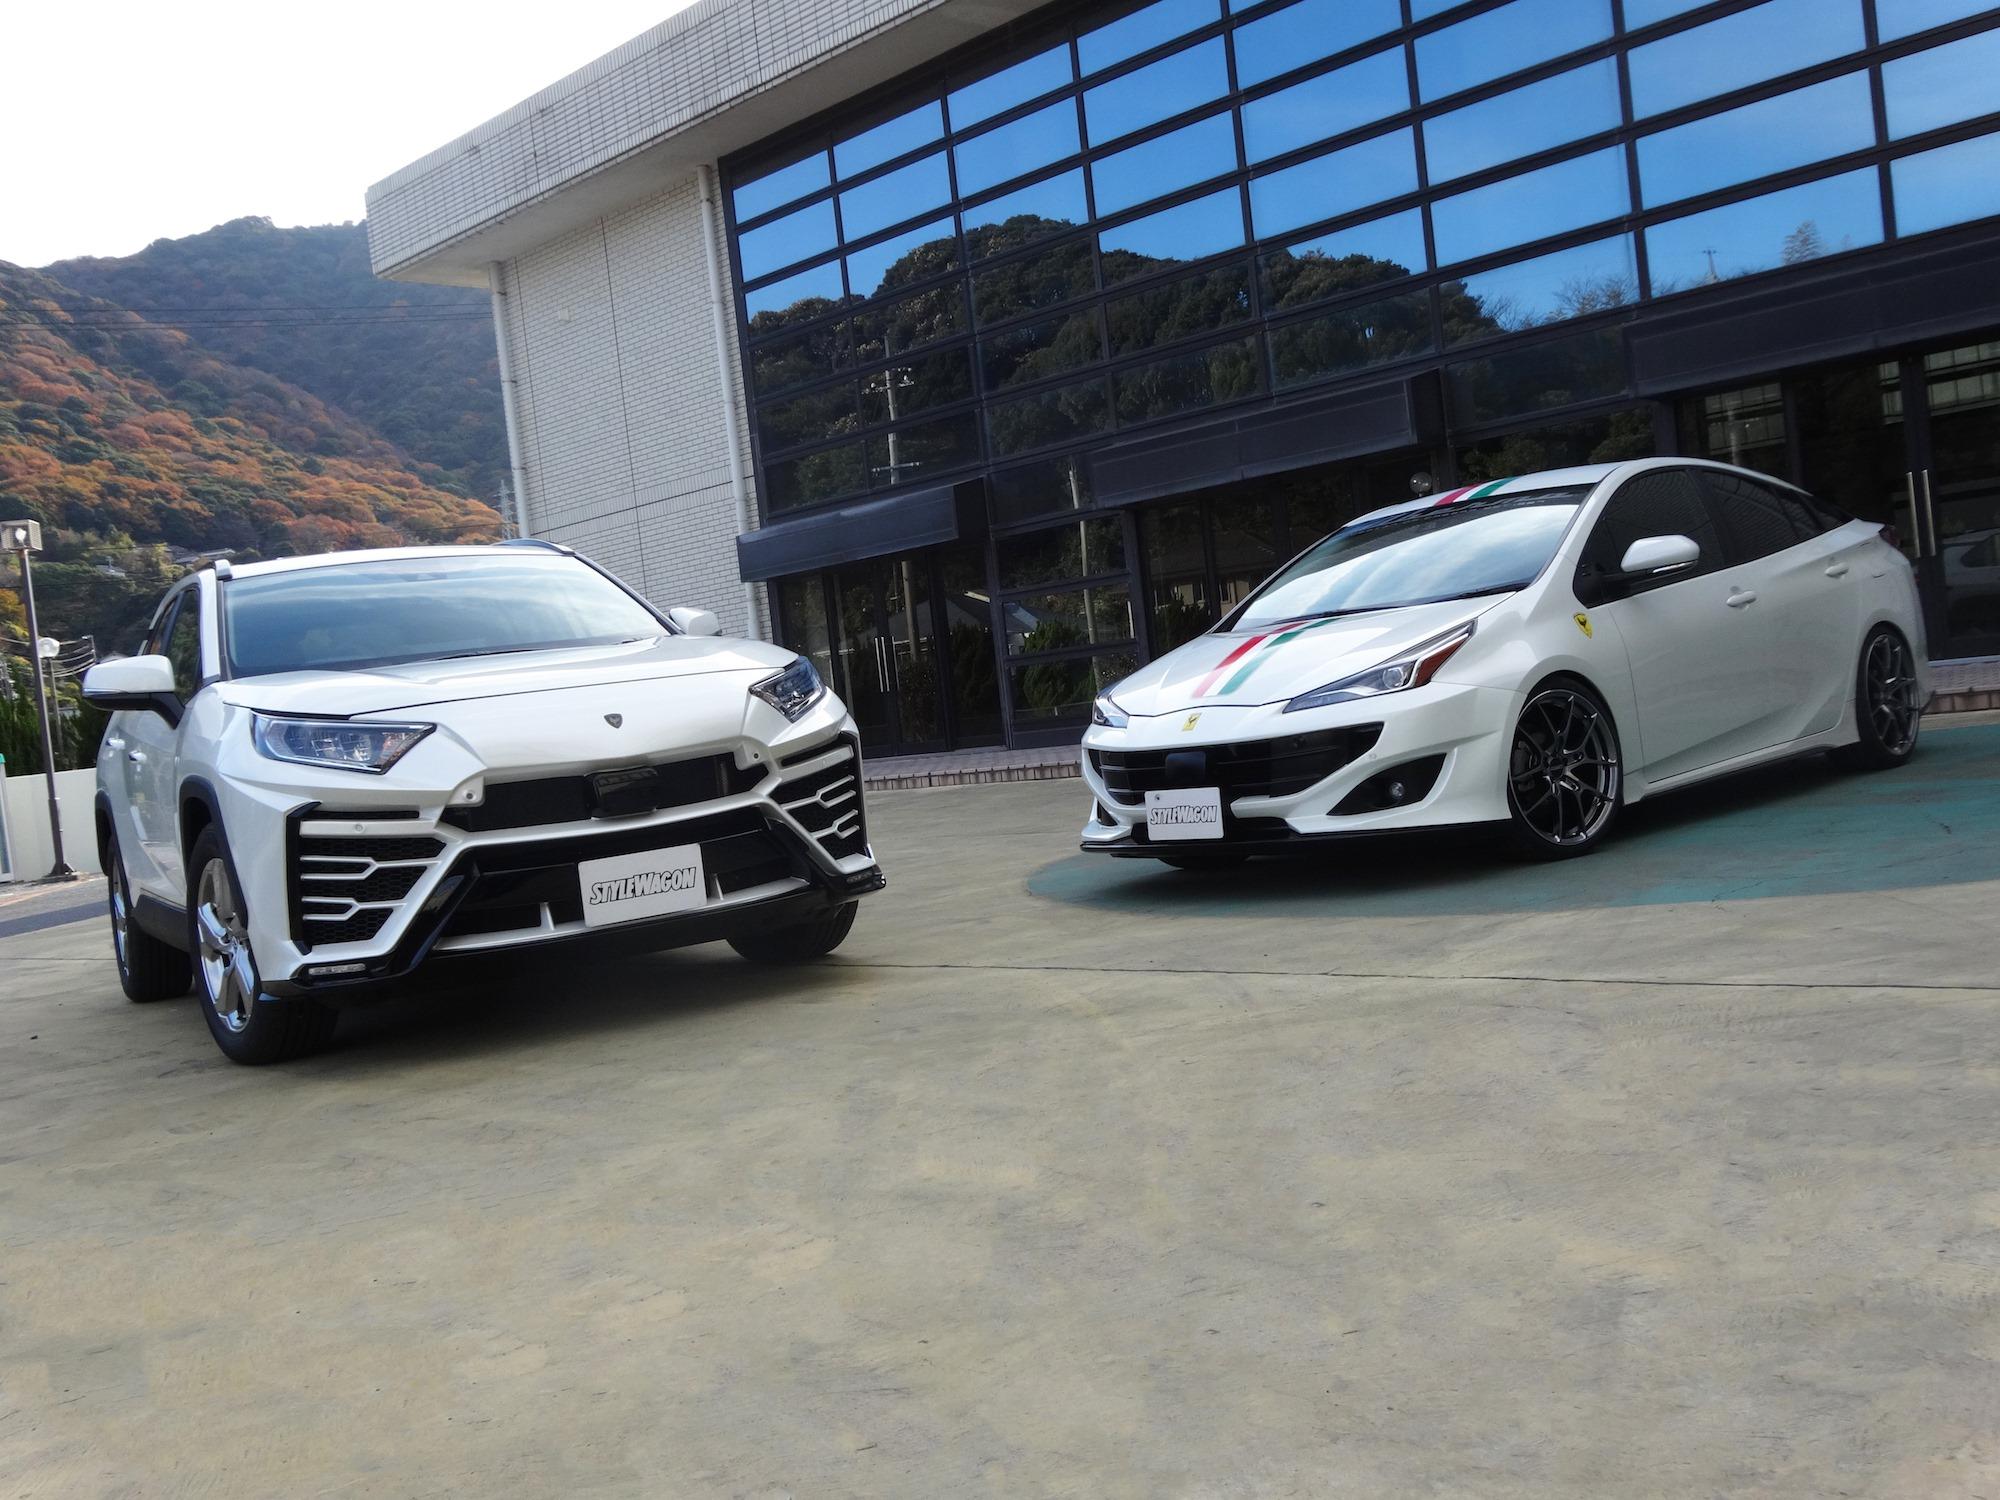 Toyota-Prius-by-Albermo-32